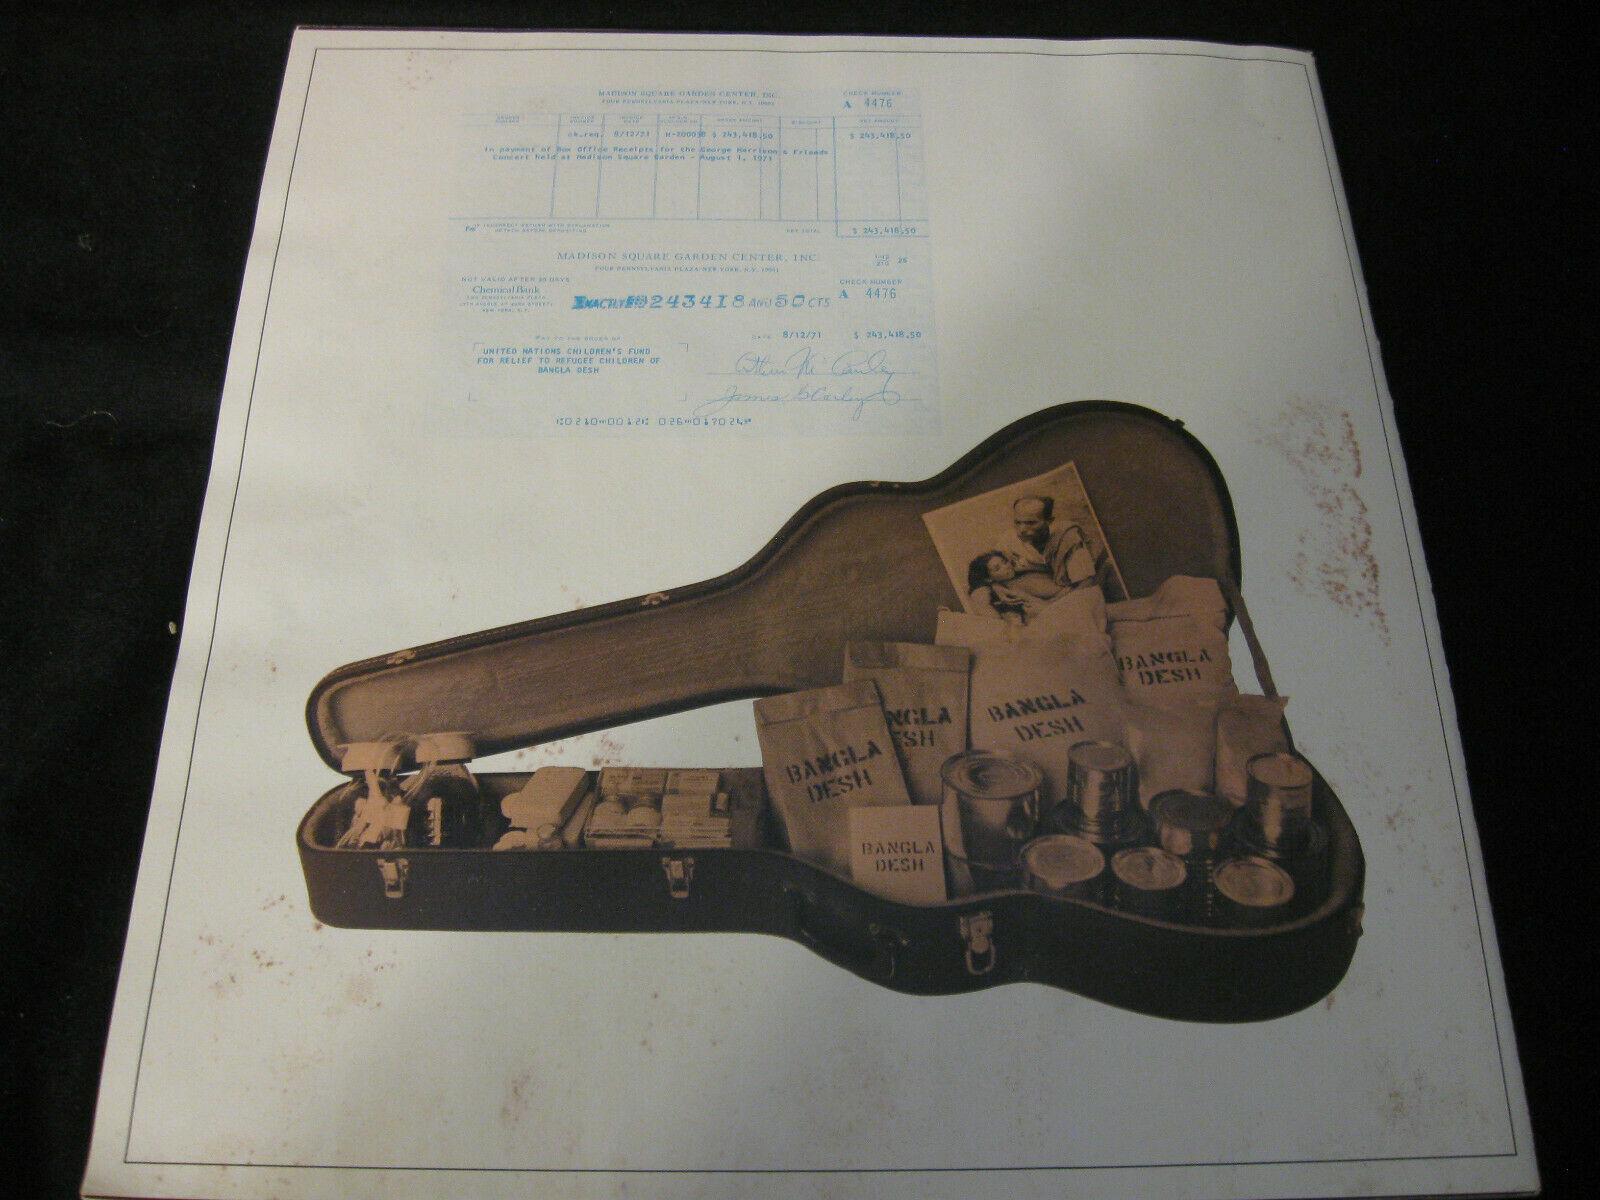 George Harrison Concert For Bangladesh Apple STCX 3385 Stereo 3 LP Vinyl Record